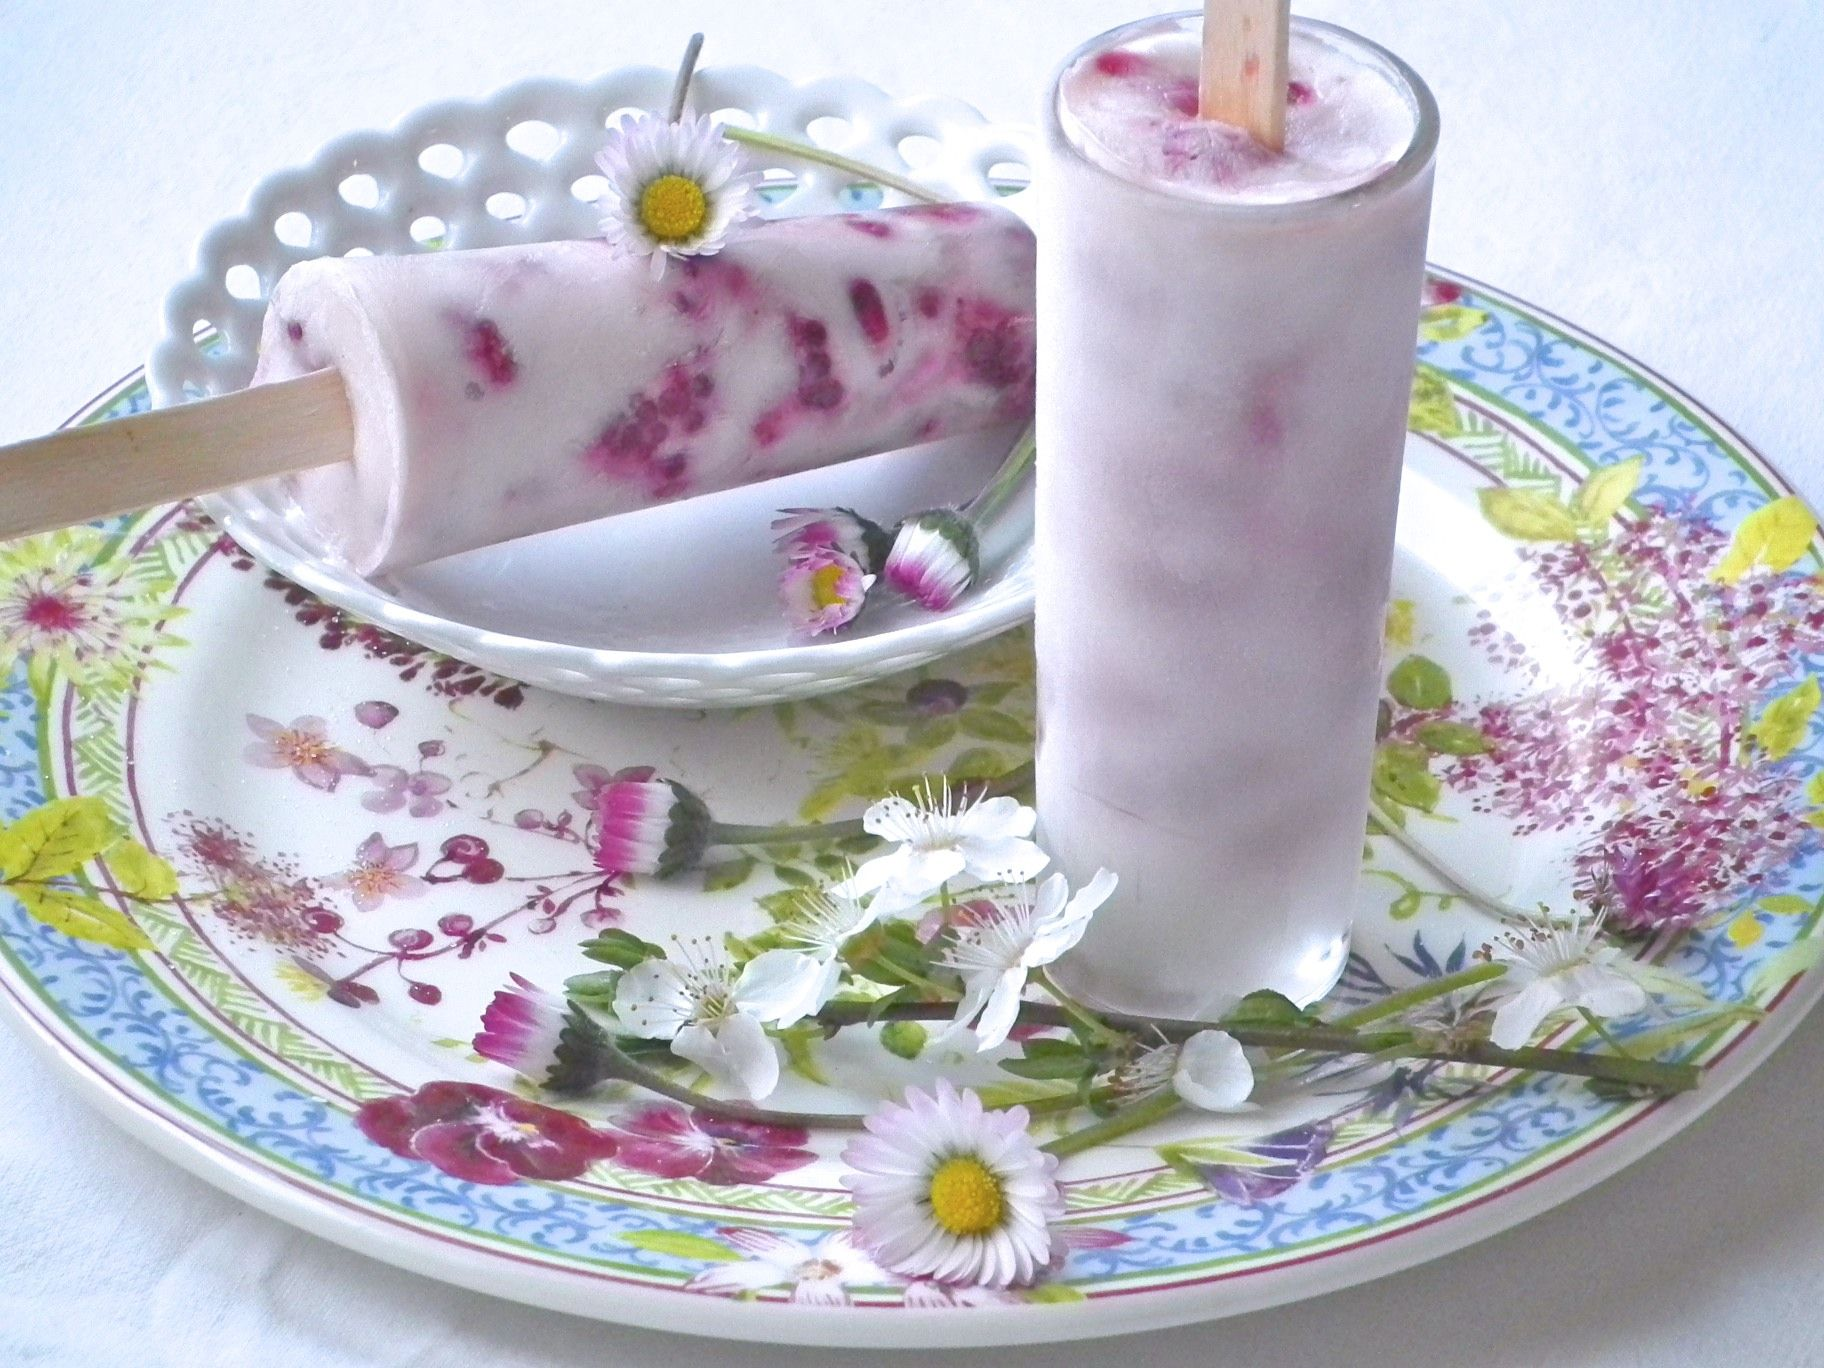 Yogurt Ice Cream with Berries | All recipes blog